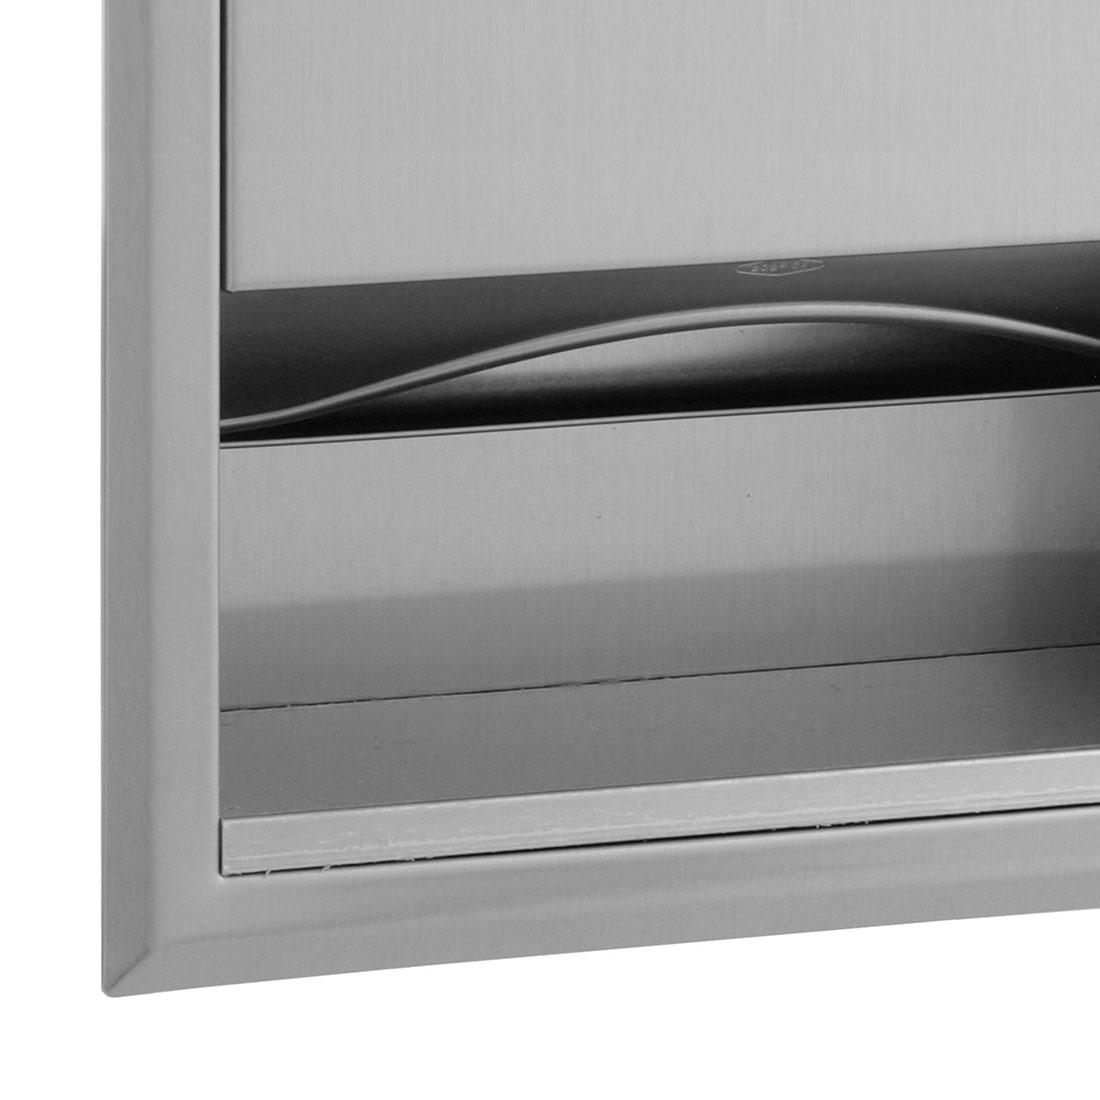 Bobrick Recessed Paper Towel Dispenser B 359 Partition Plus